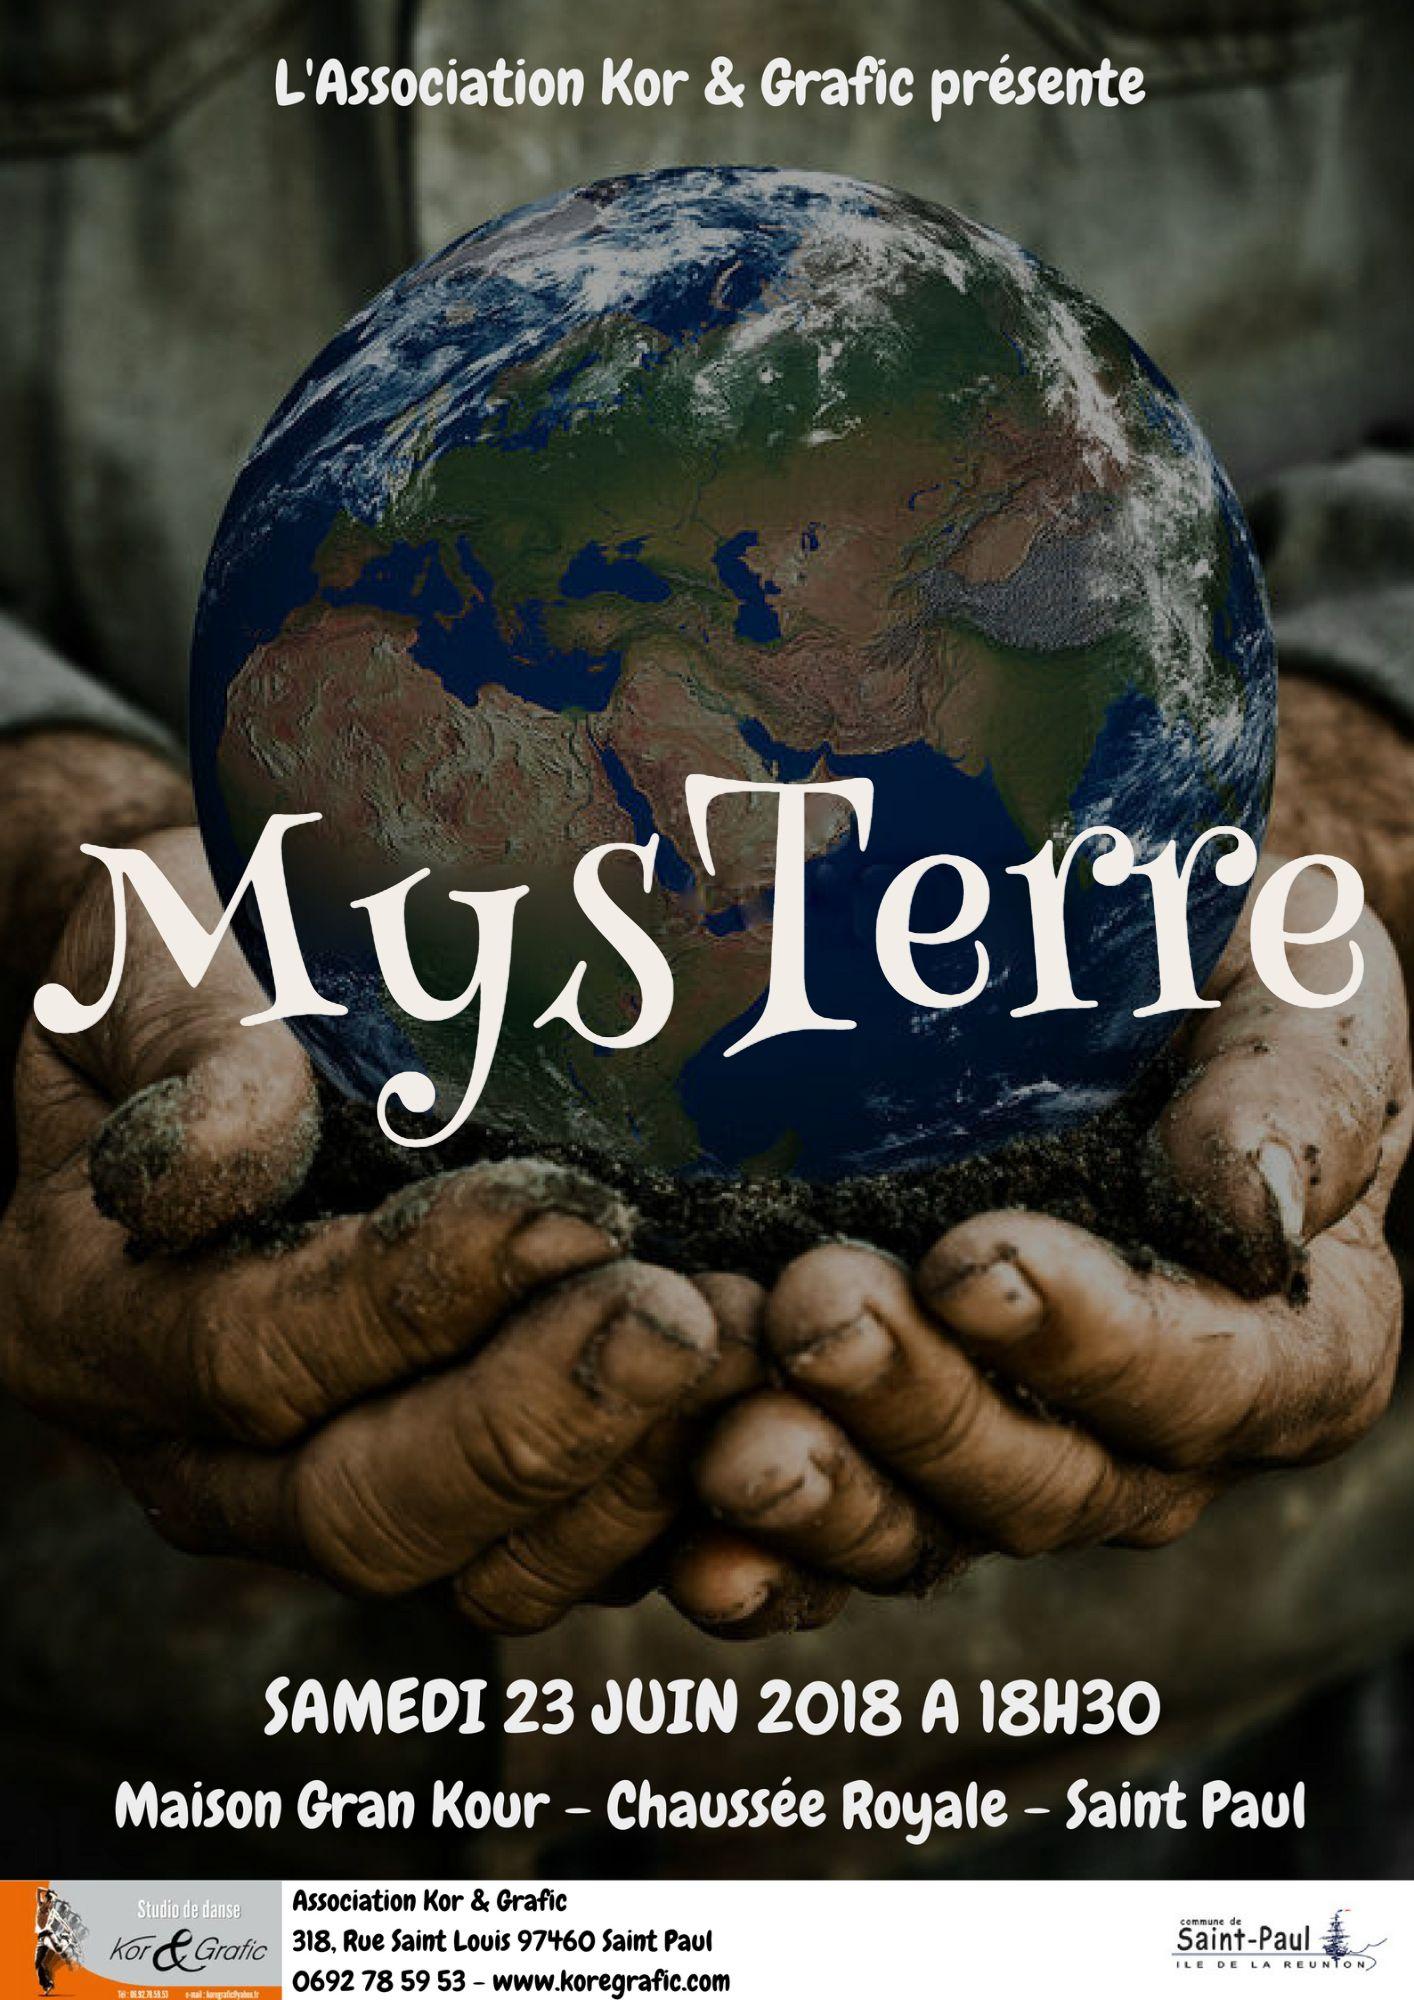 MysTerre 2018 affiche officielle